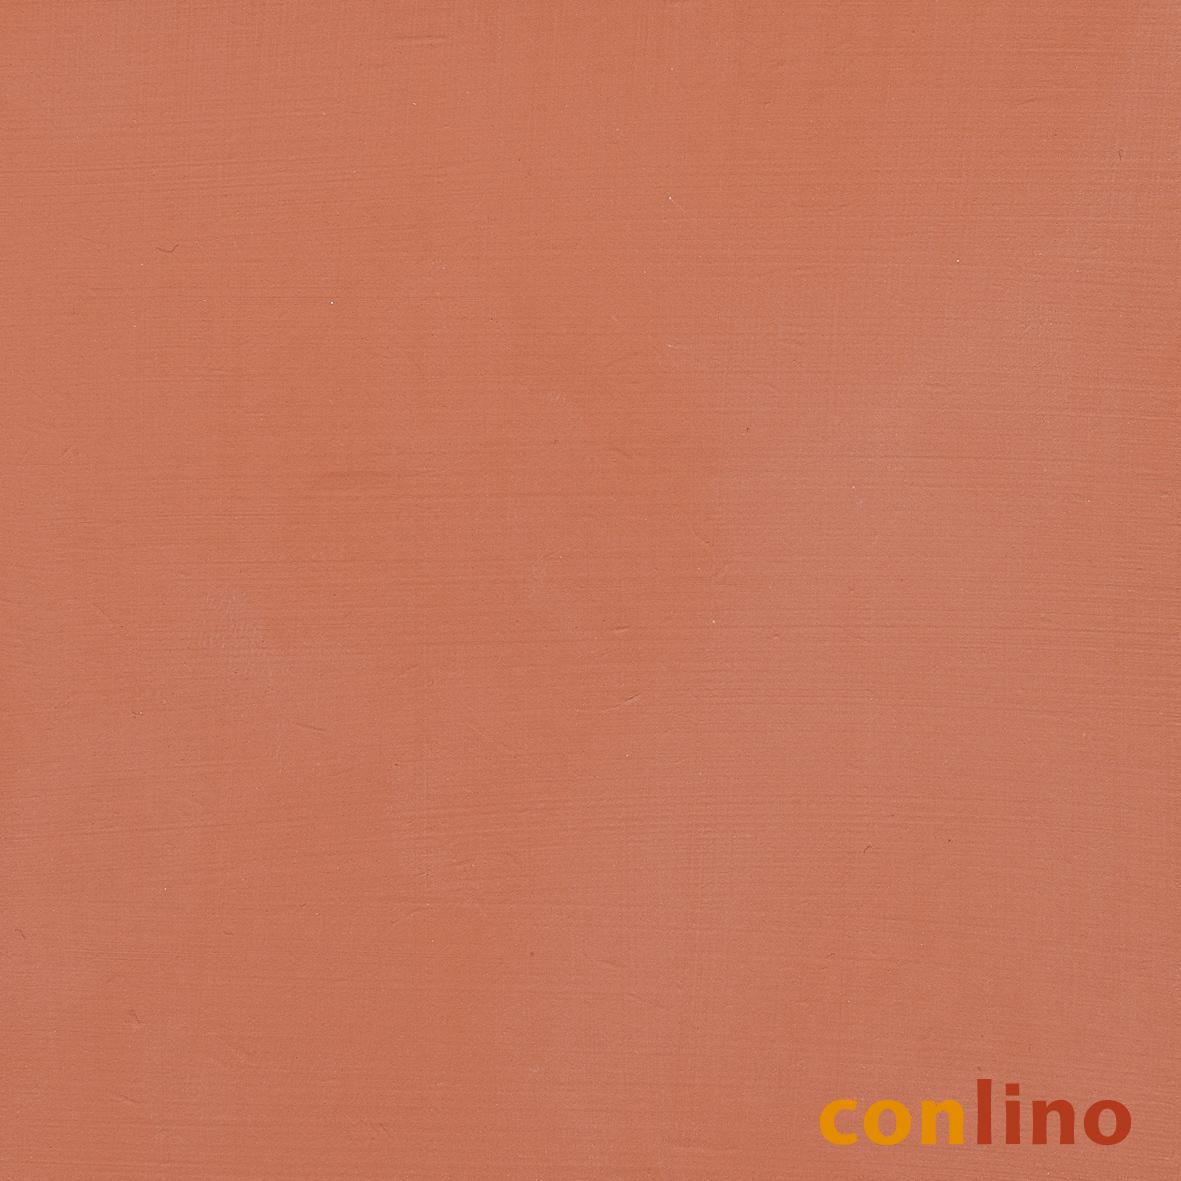 conluto Lehmfarbe Lehmrot CL 120